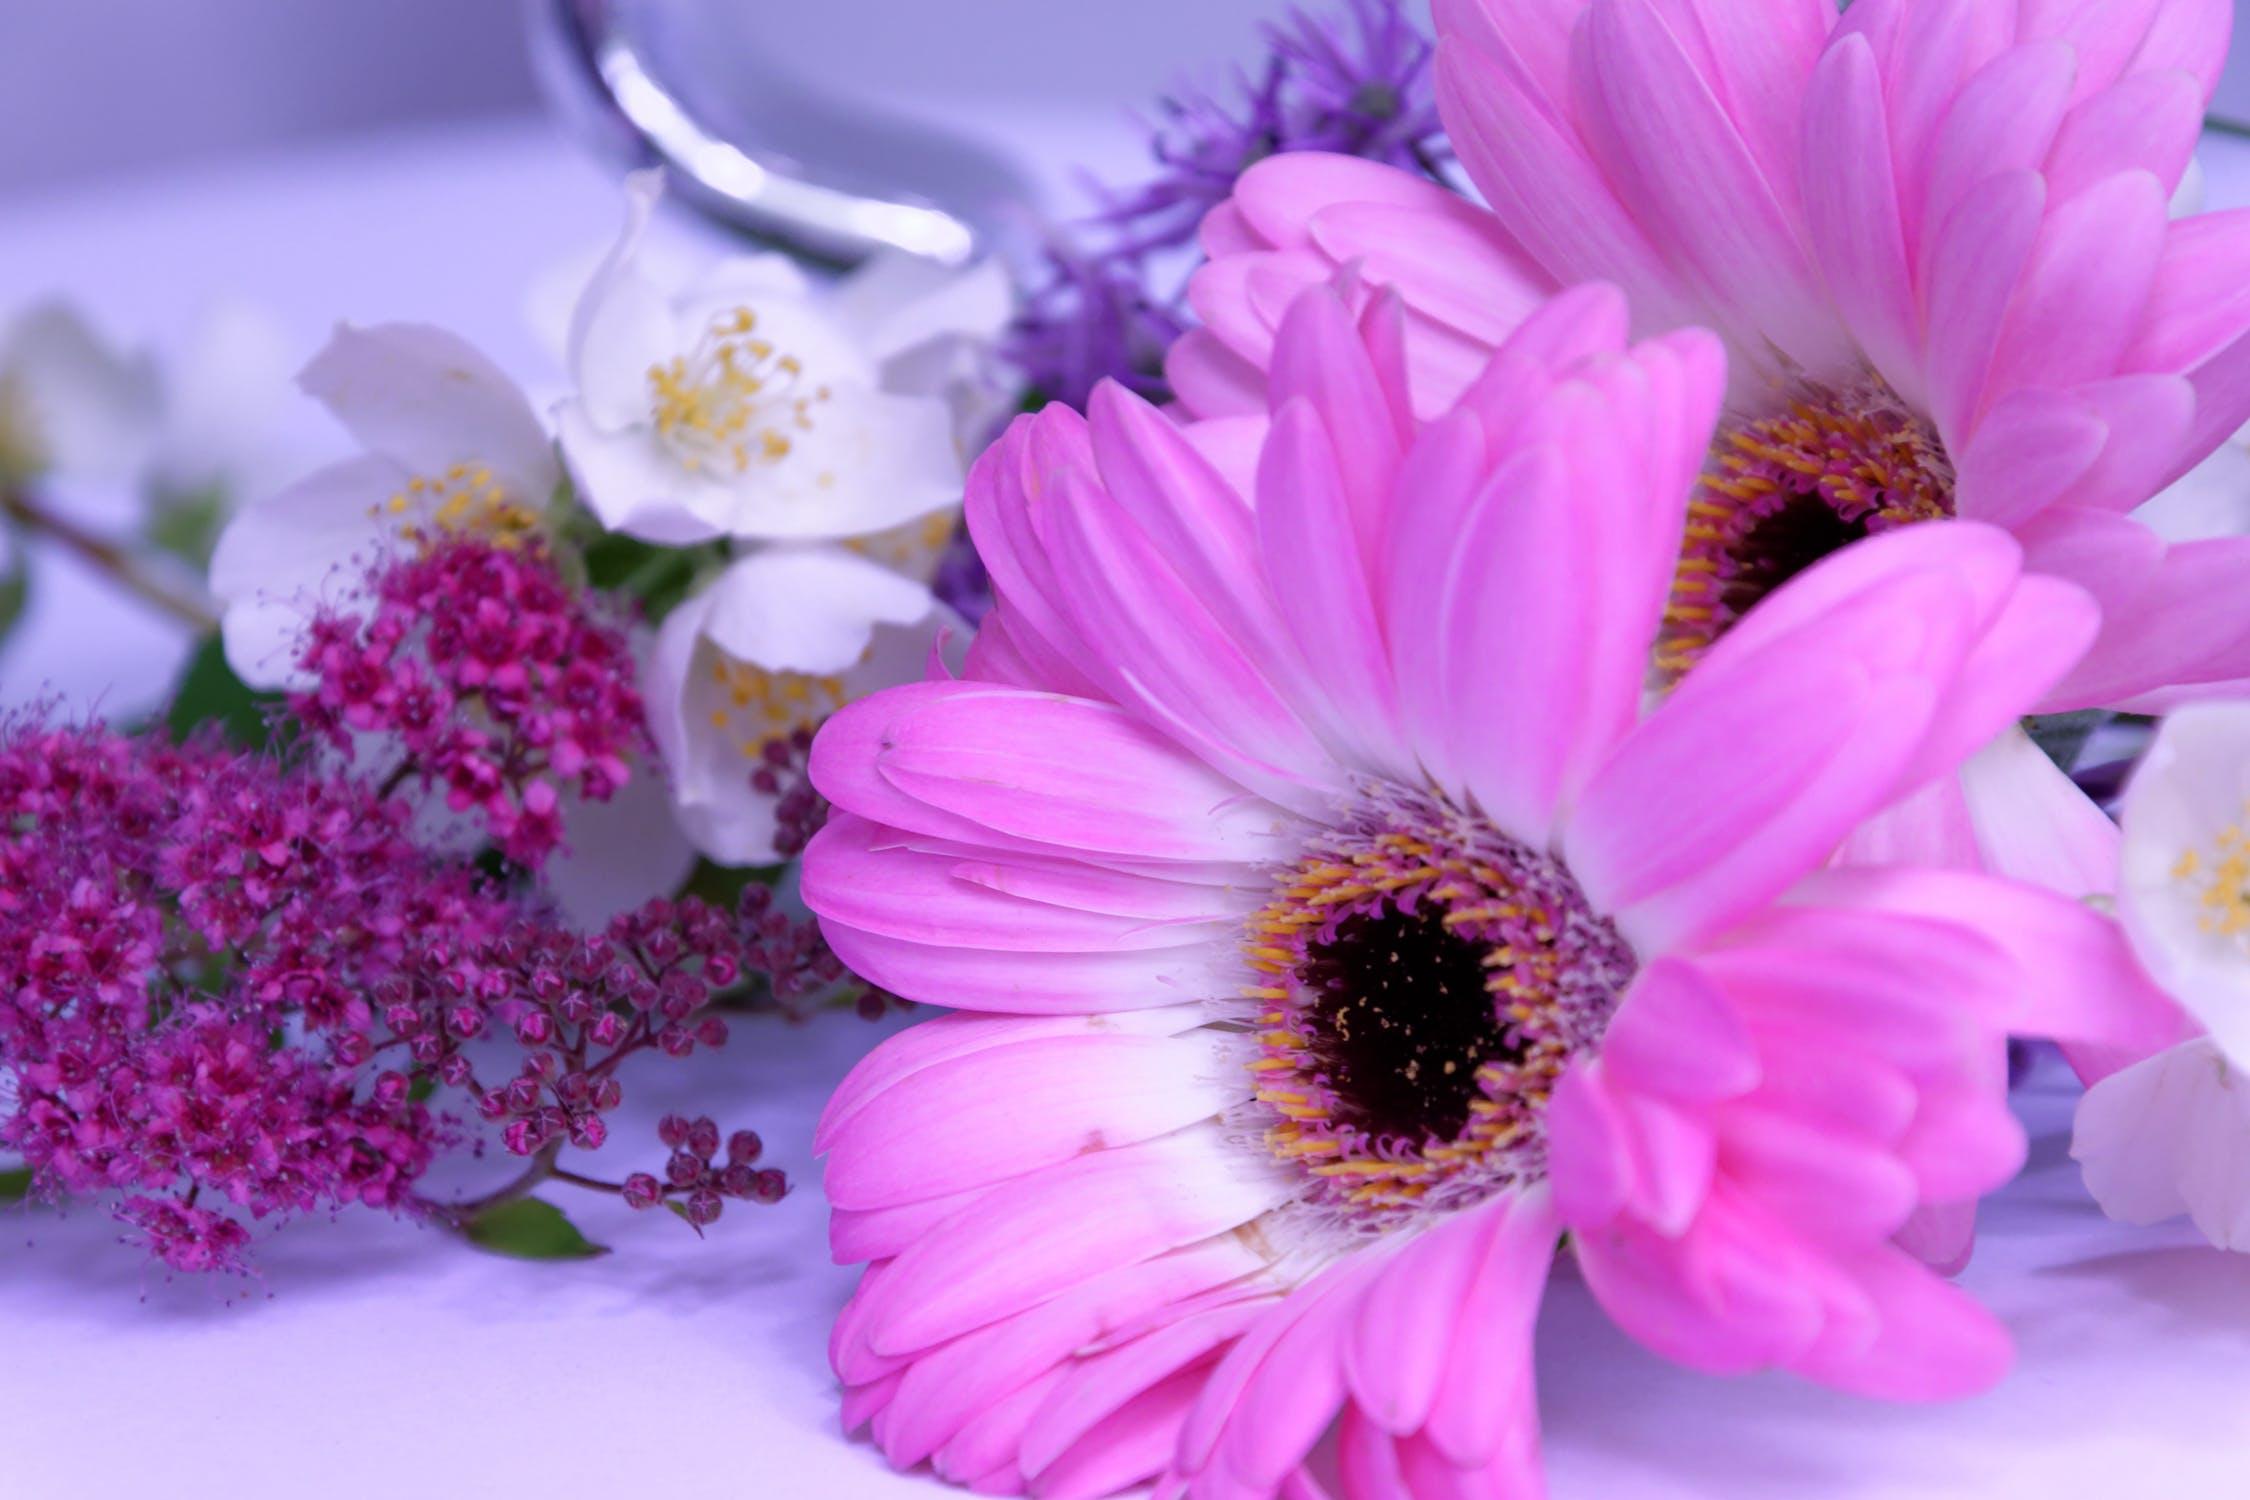 Jasmine amazing flower lovely tea befantastico jasmine amazing flower lovely tea izmirmasajfo